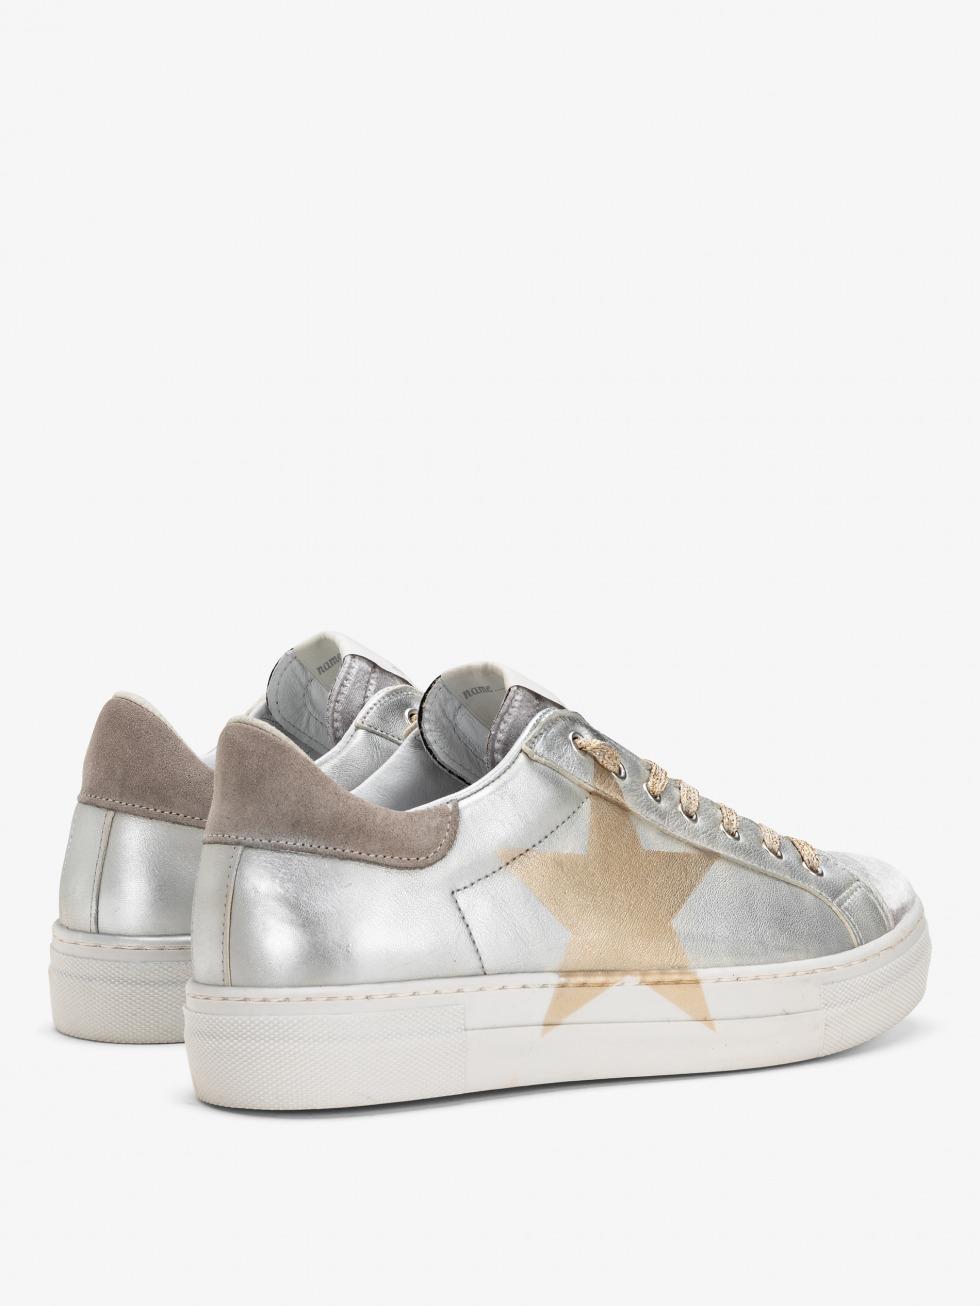 Sneakers Martini Nuvola Velvet Grey - Stella